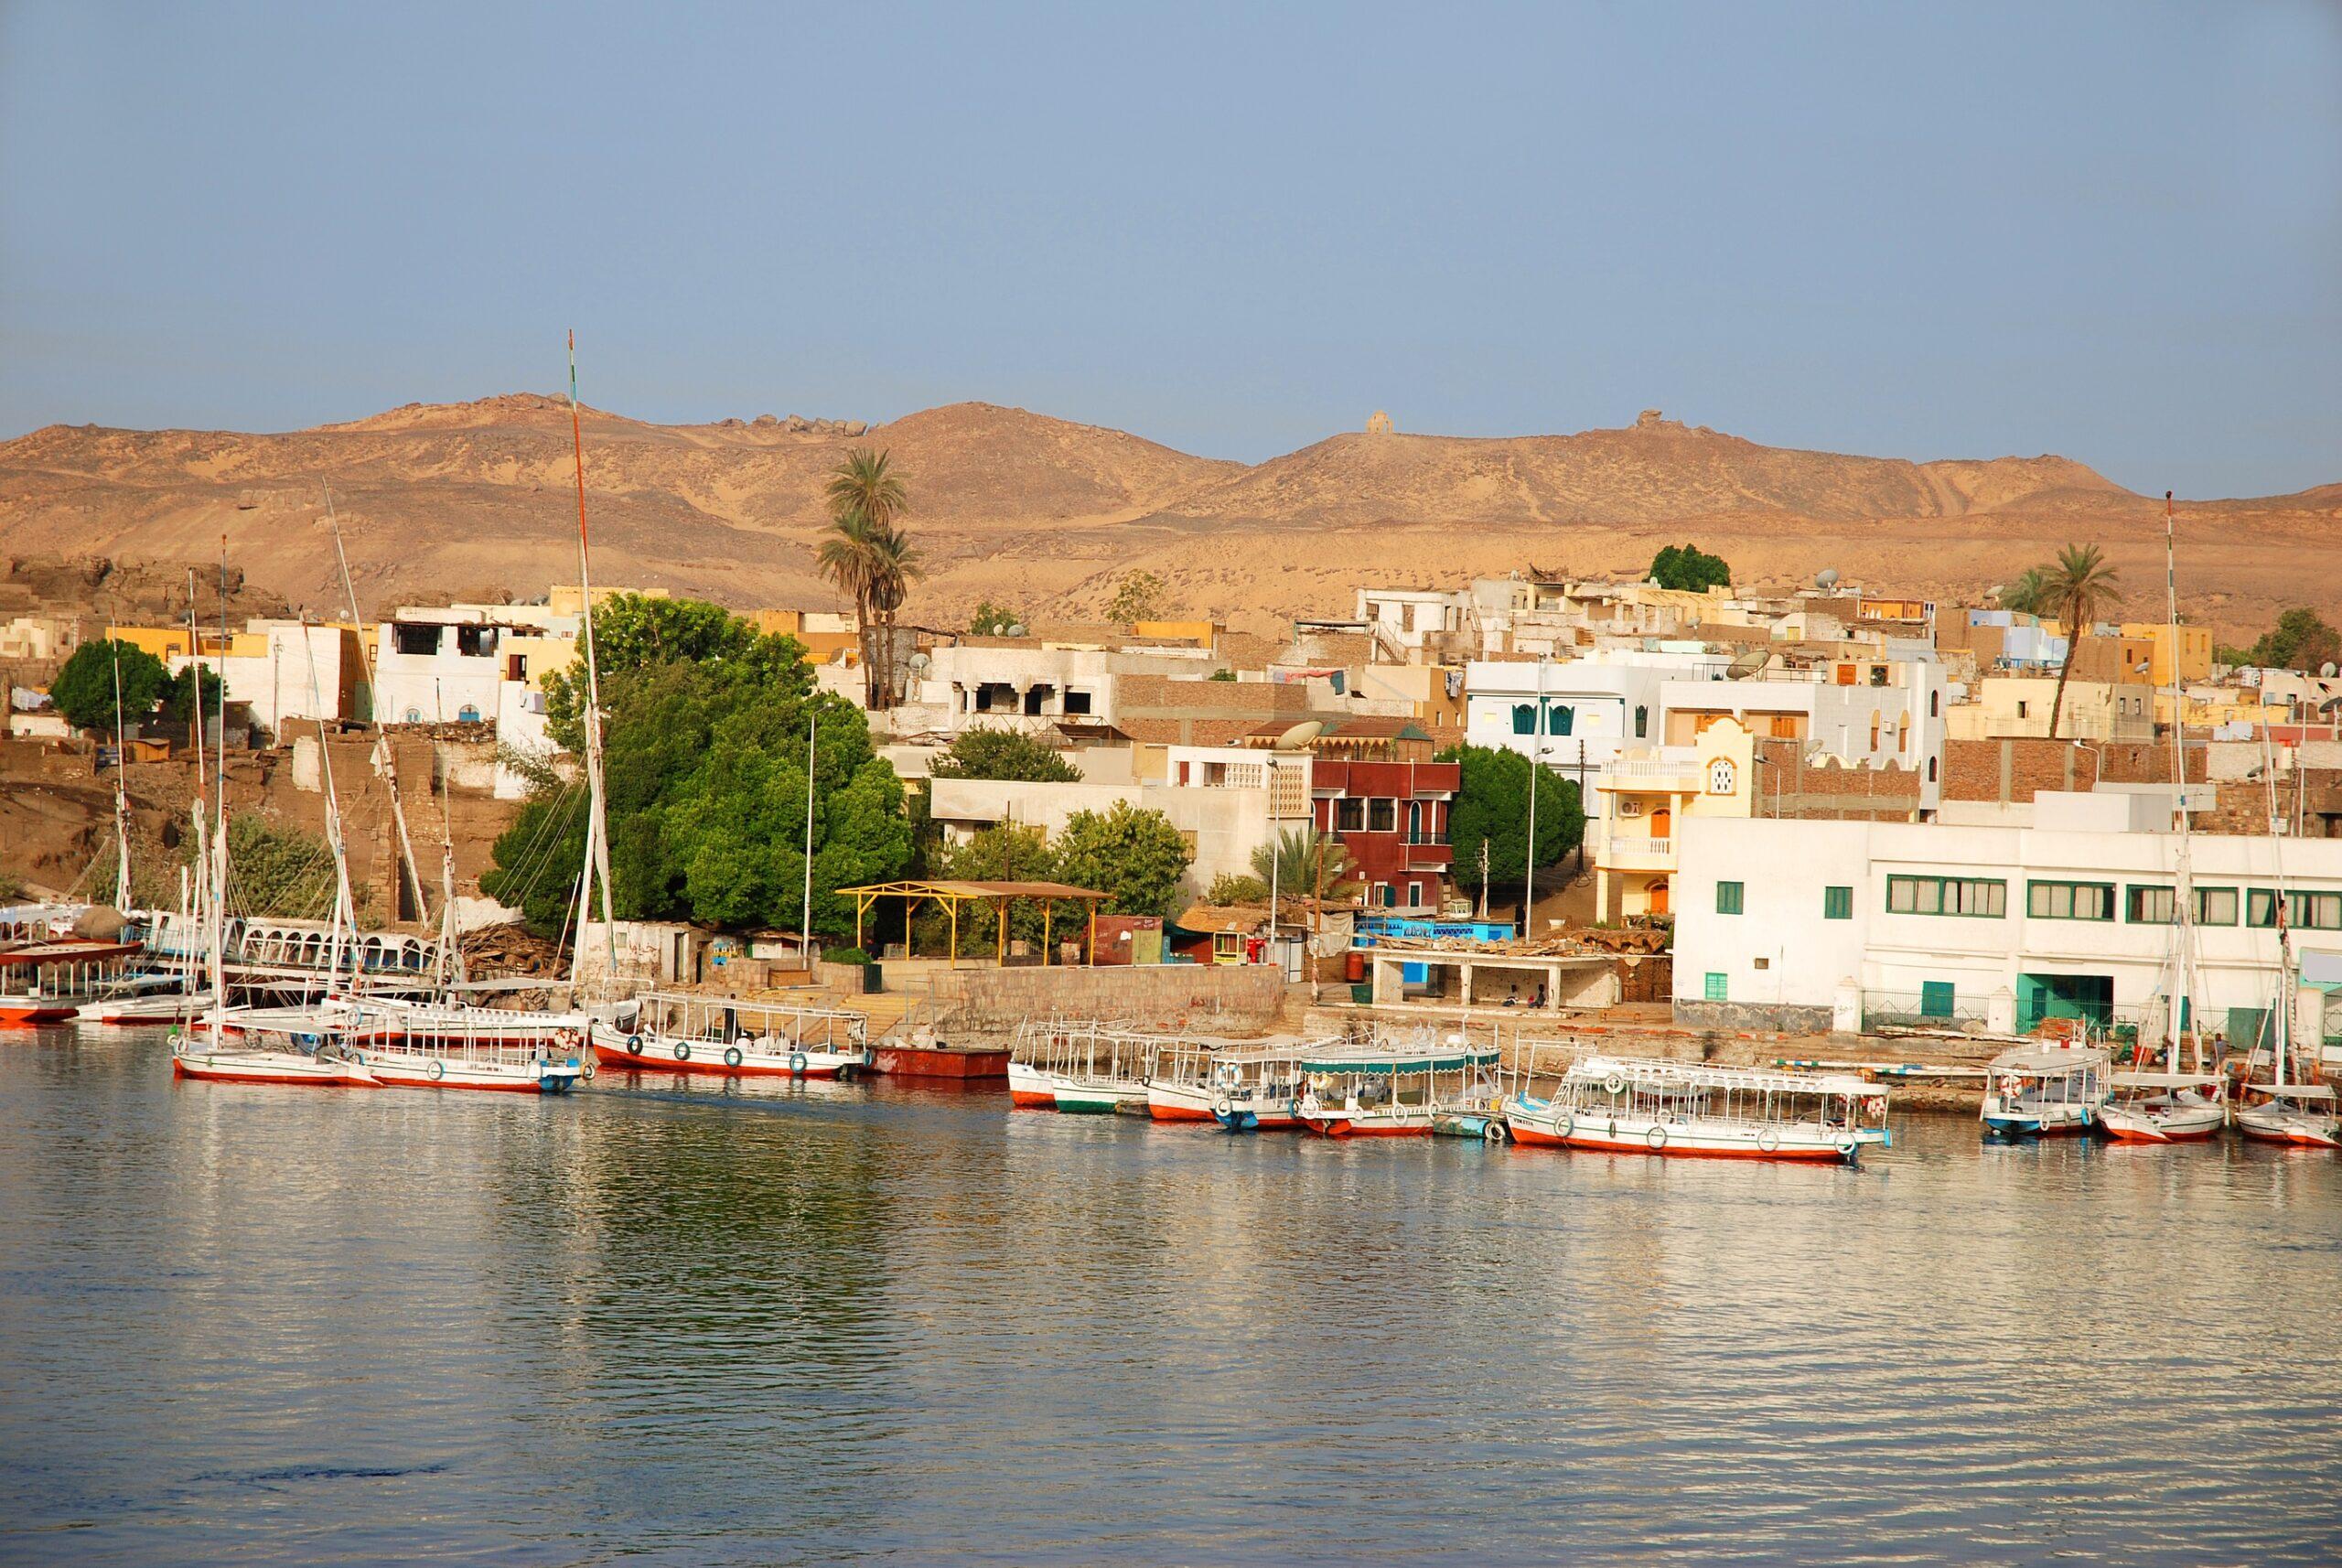 Banks of Nile river in Aswan, Egypt